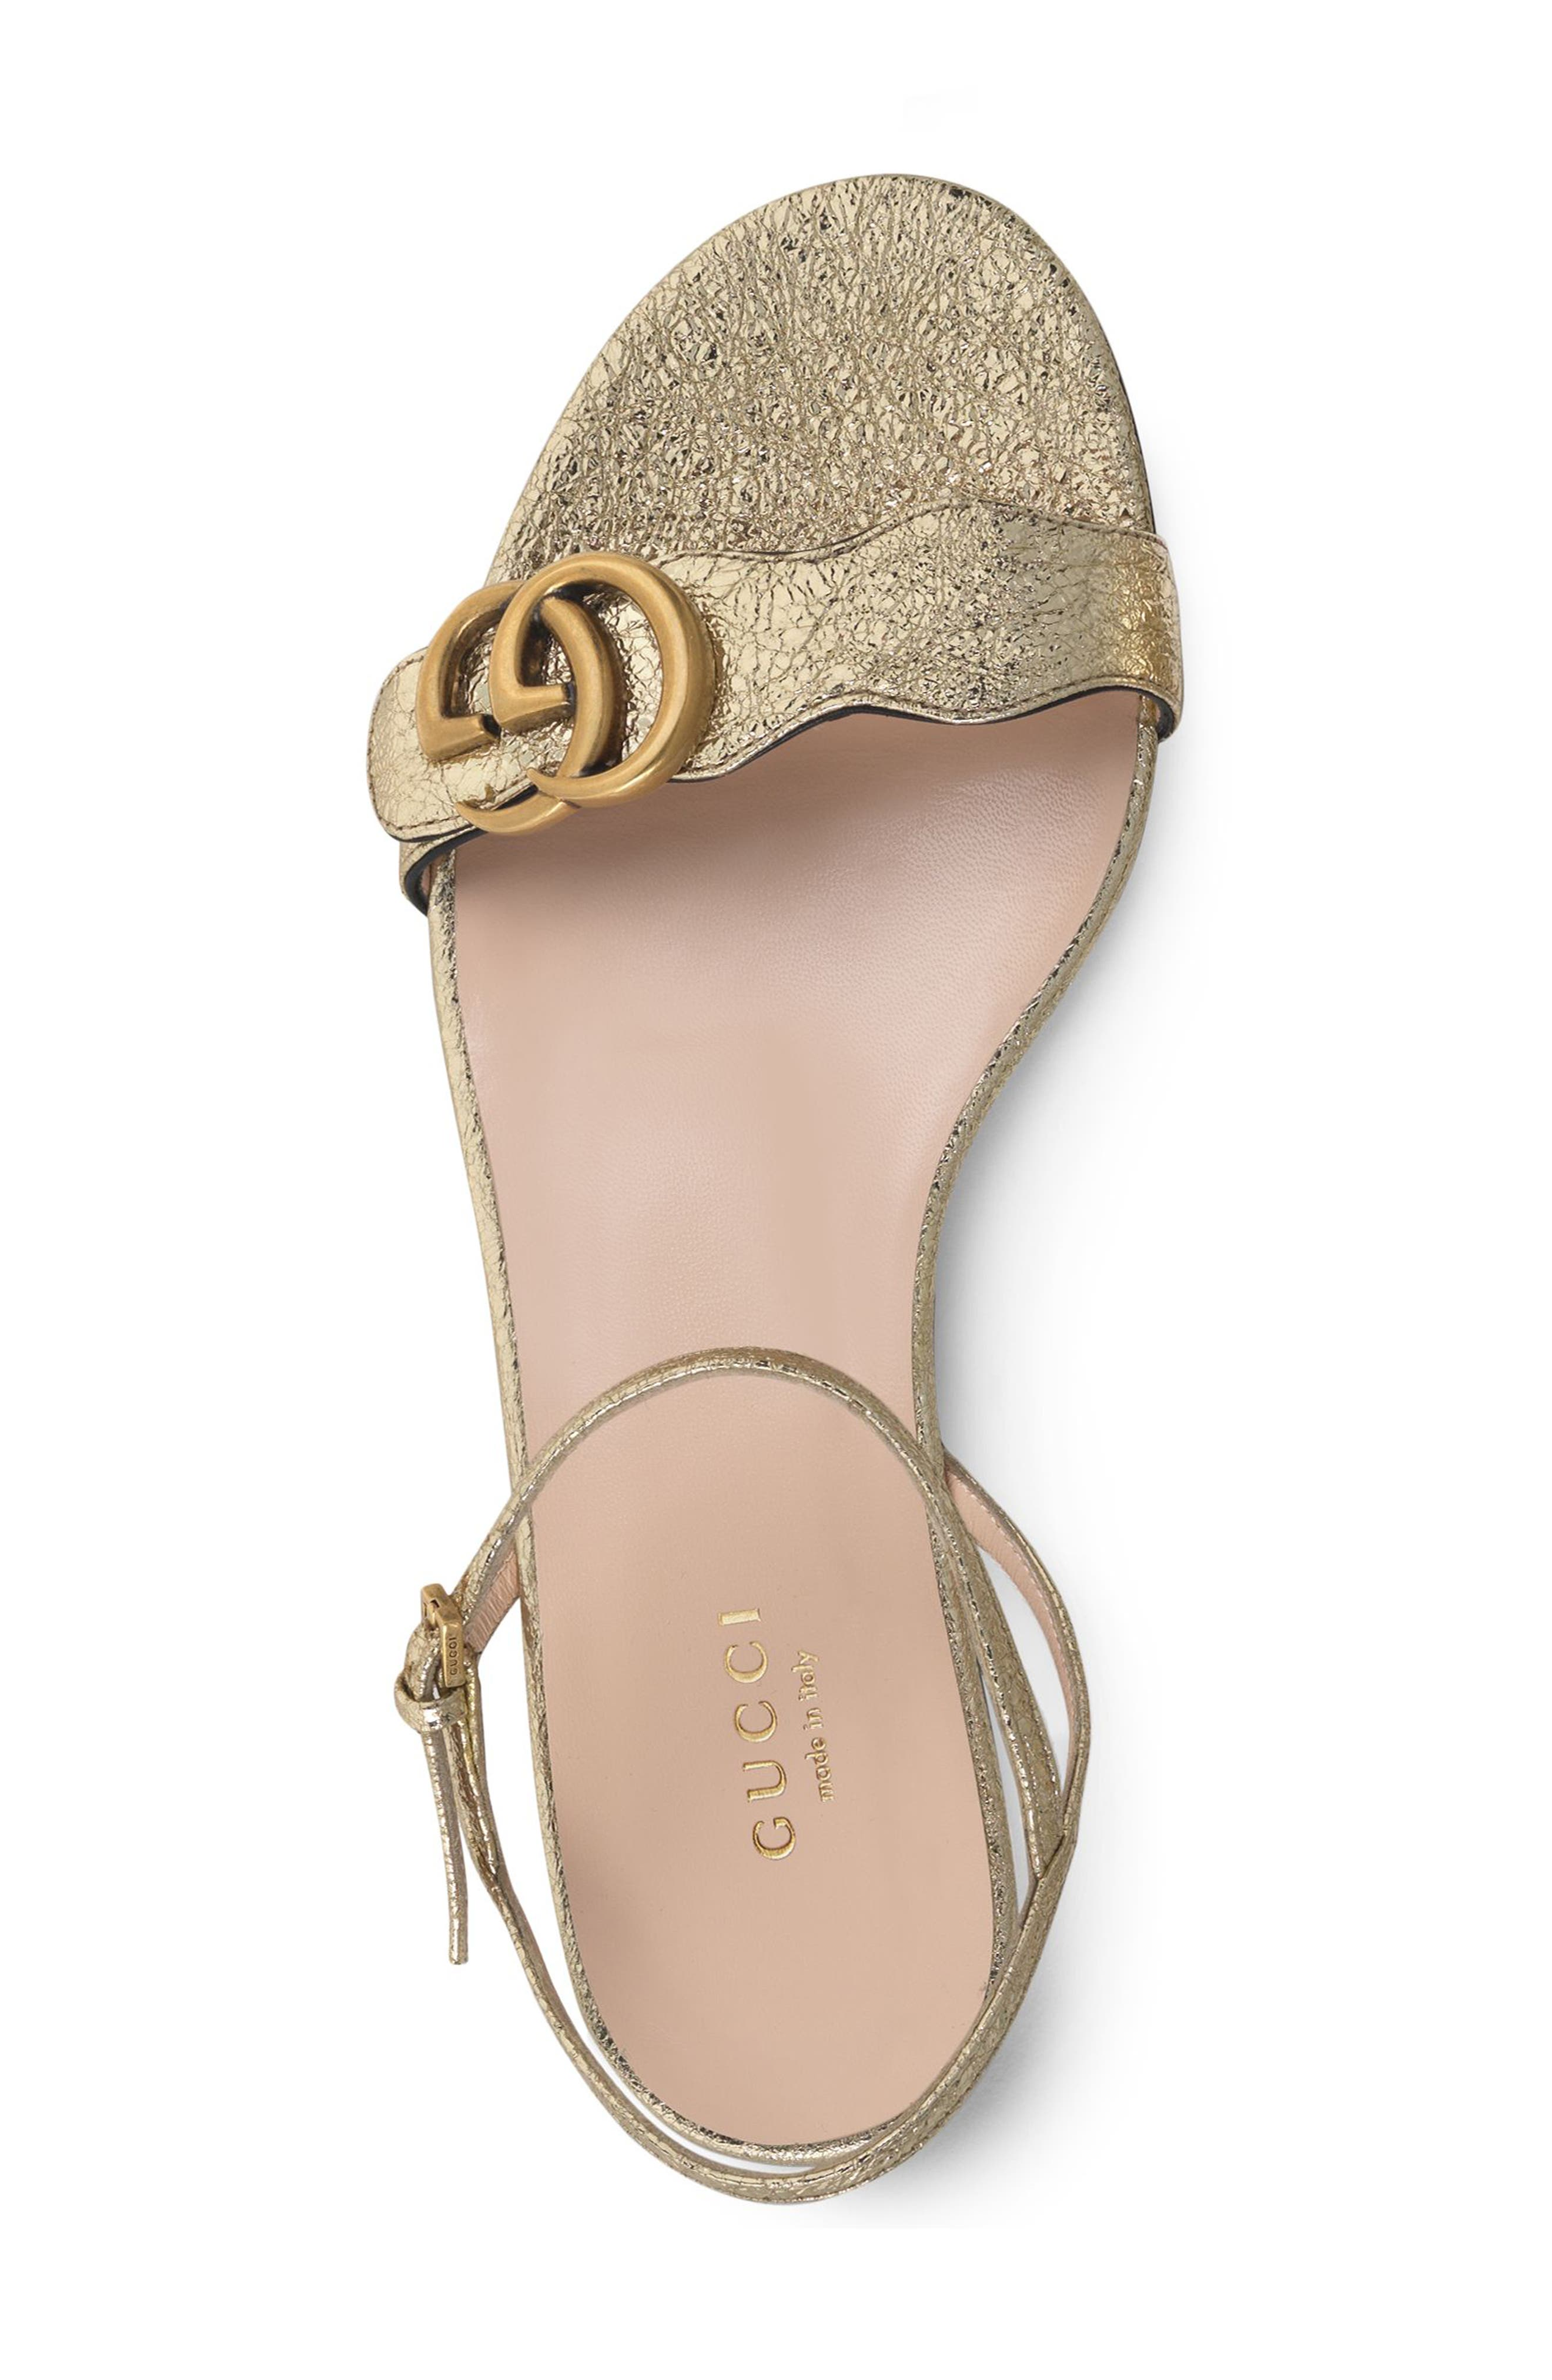 GUCCI, Marmont Quarter Strap Flat Sandal, Alternate thumbnail 3, color, PLATINO